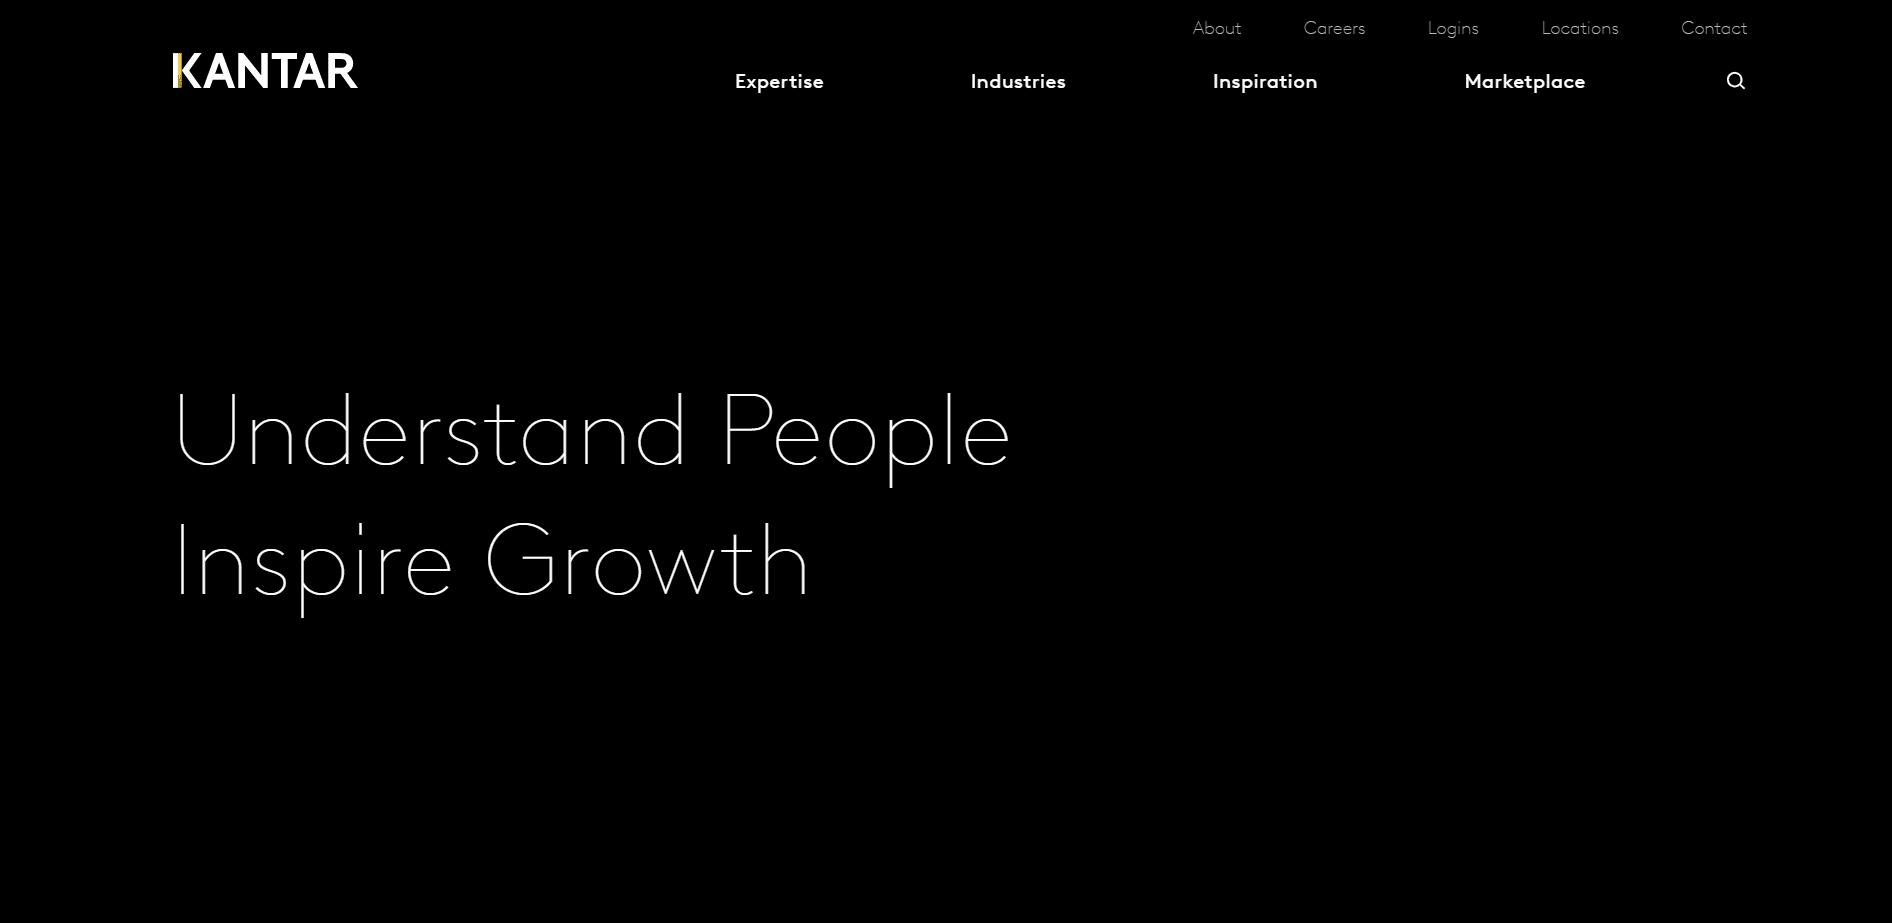 Kantar  Market Research Company